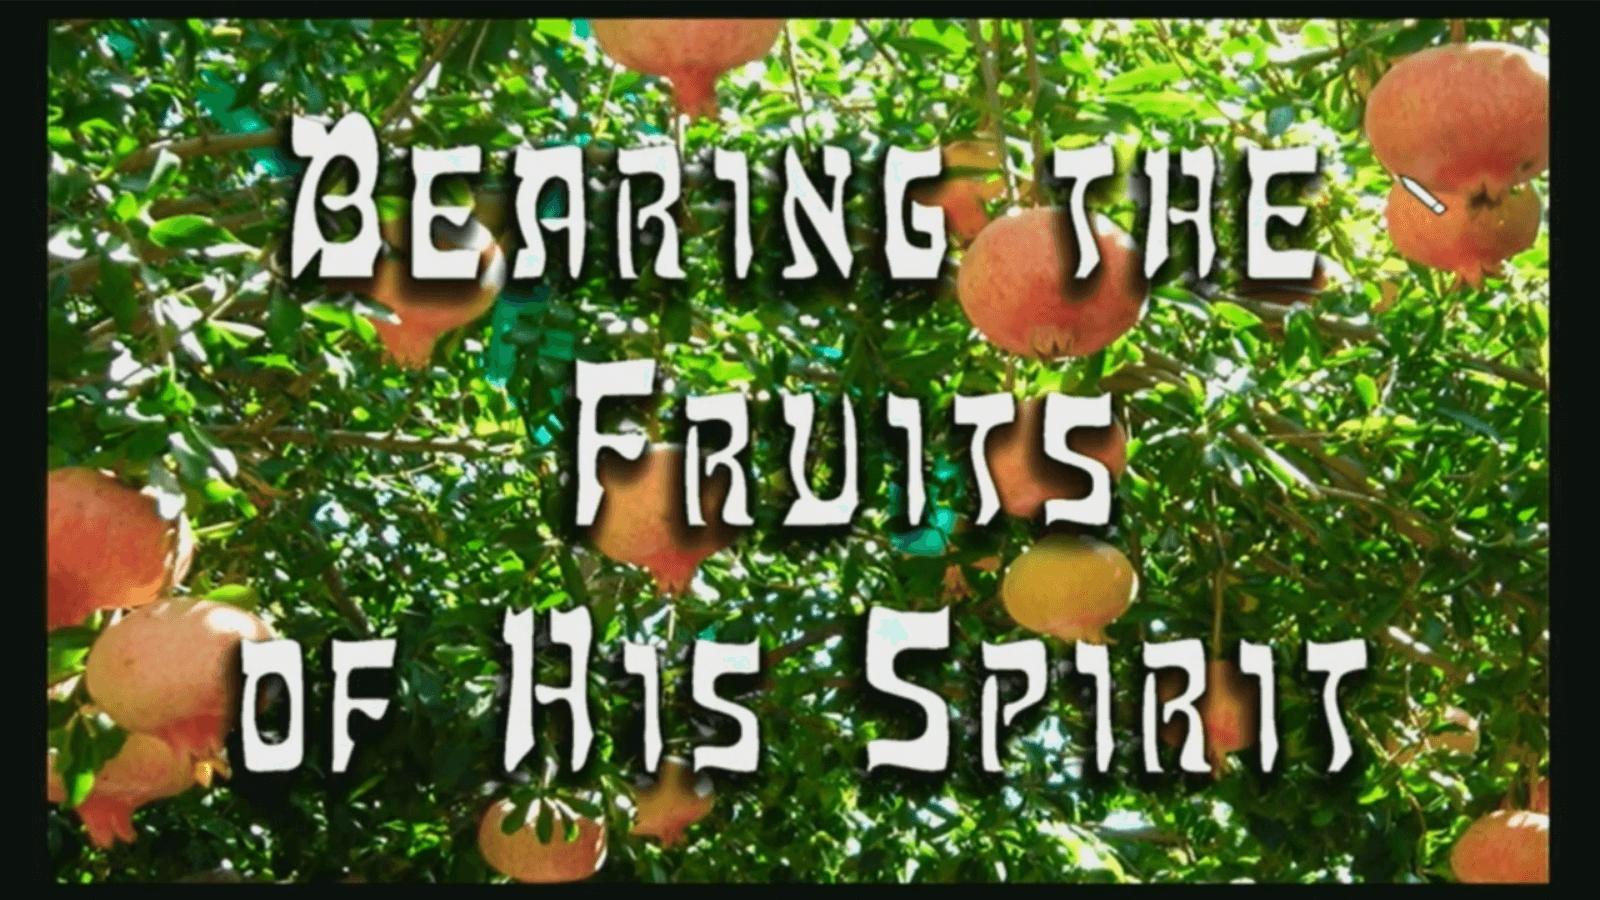 Bearing the Fruits of His Spirit